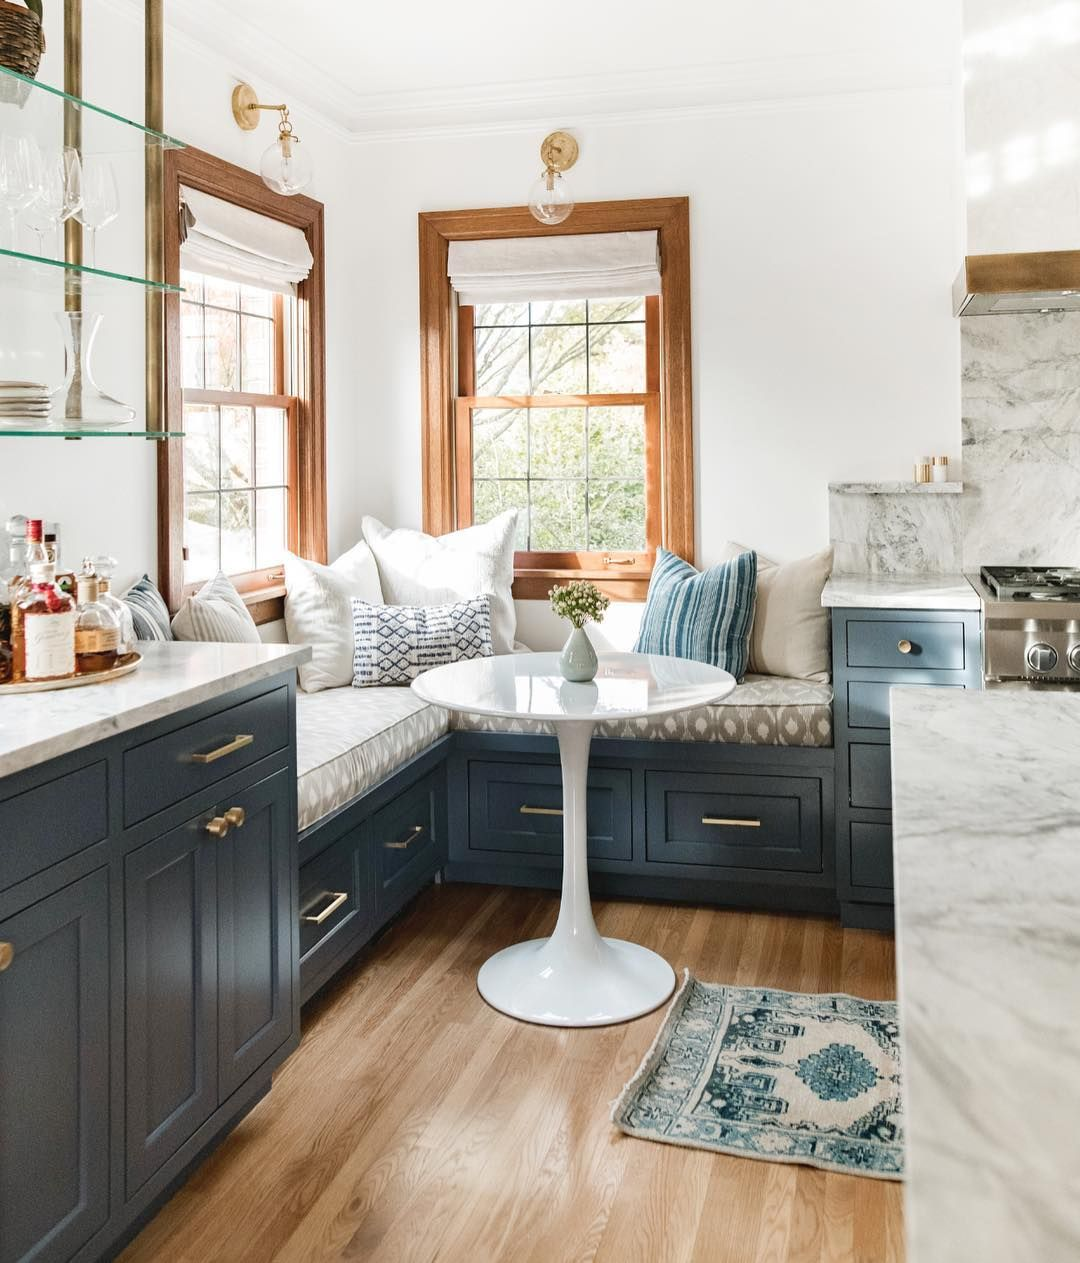 An Interior Designer Shares Her Best Tips for Upgrading Your Kitchen